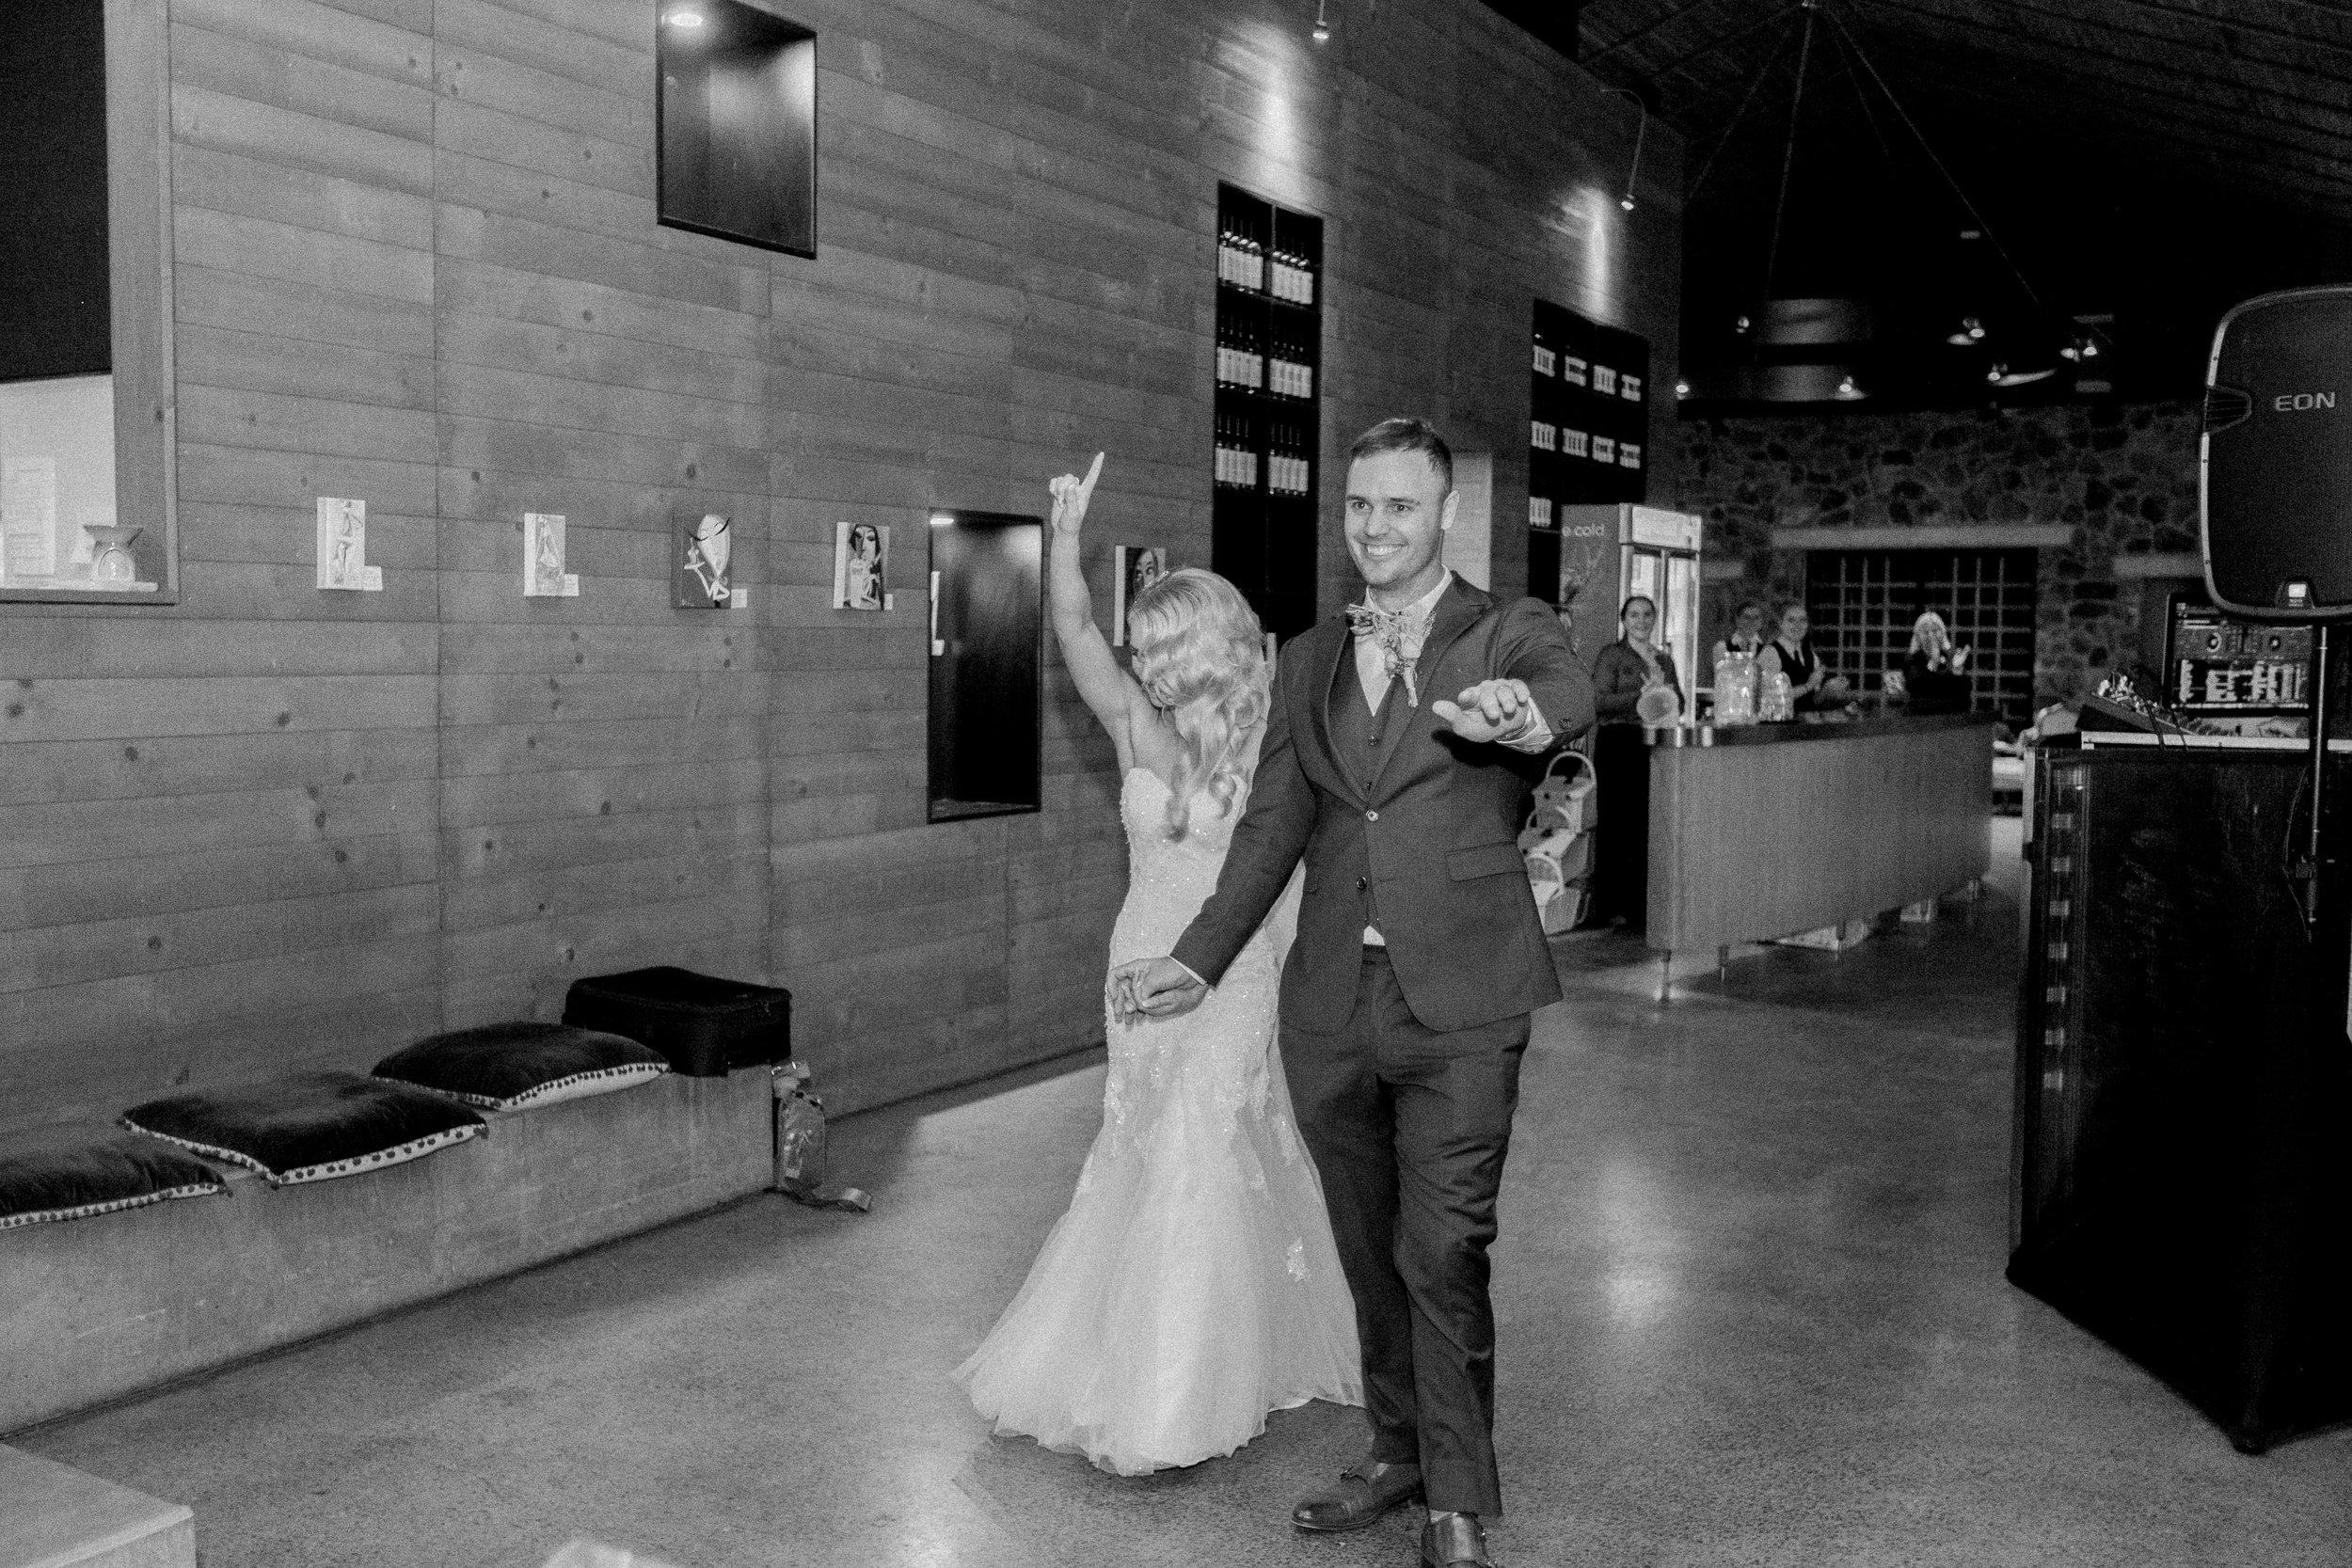 Kooroomba-Vineyard-Lavender-Farm-Wedding-Fine-Art-Lauren-Olivia-71.jpg